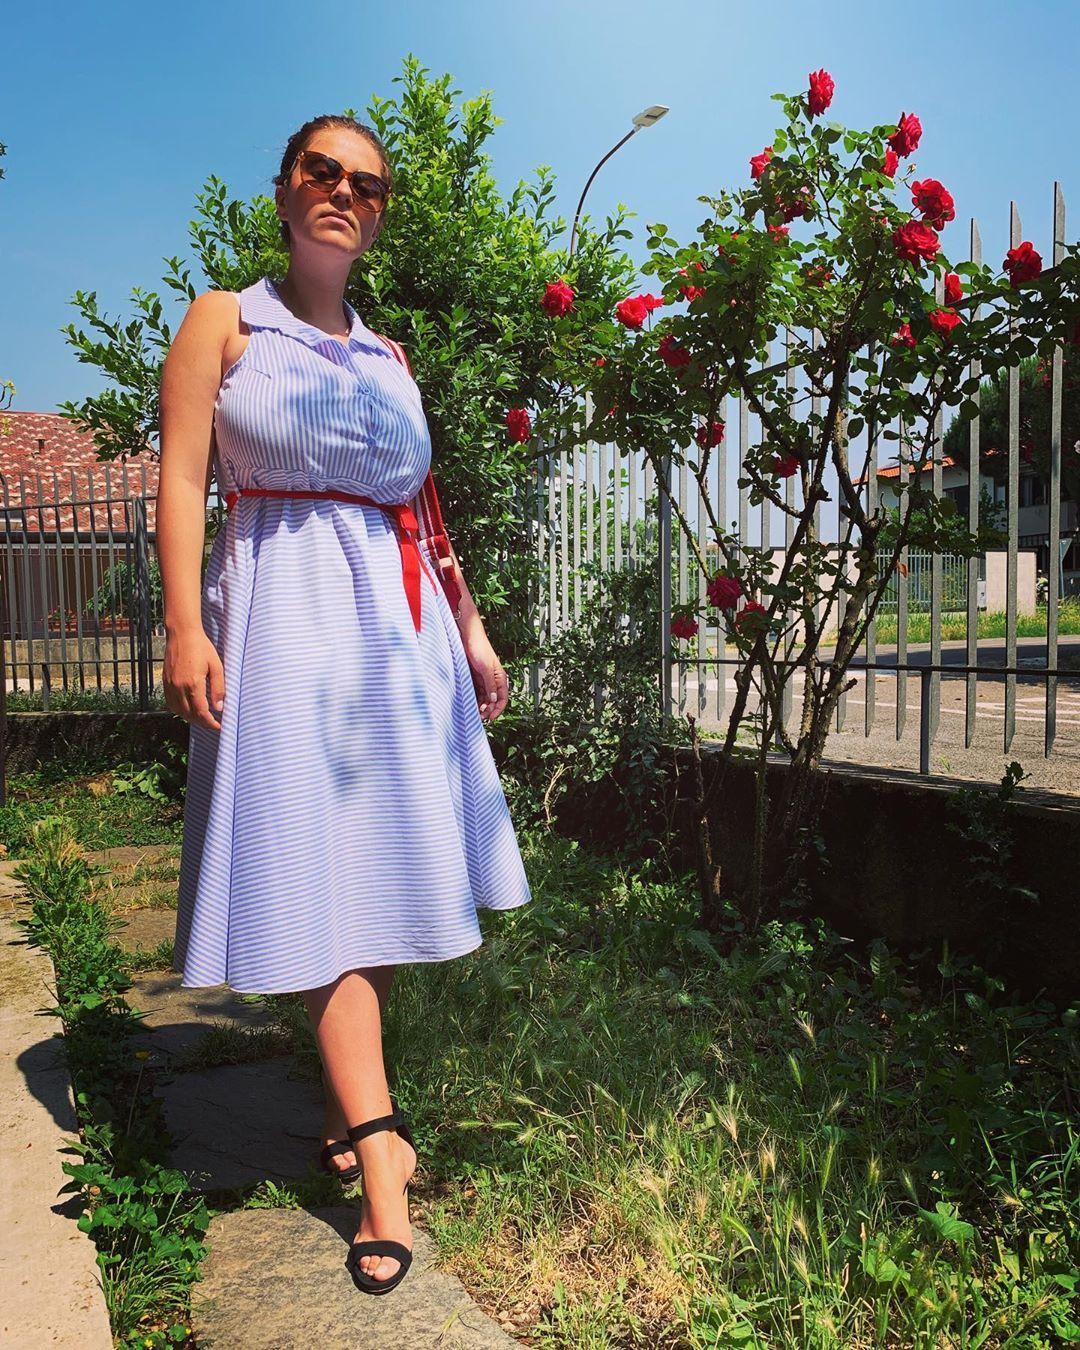 328 Likes 8 Comments Mădălina Ioana Filip Mady Gio On Instagram Estate2019 Parabiago Giornatadainonni Gi In 2020 Summer Dresses Shoulder Dress Fashion